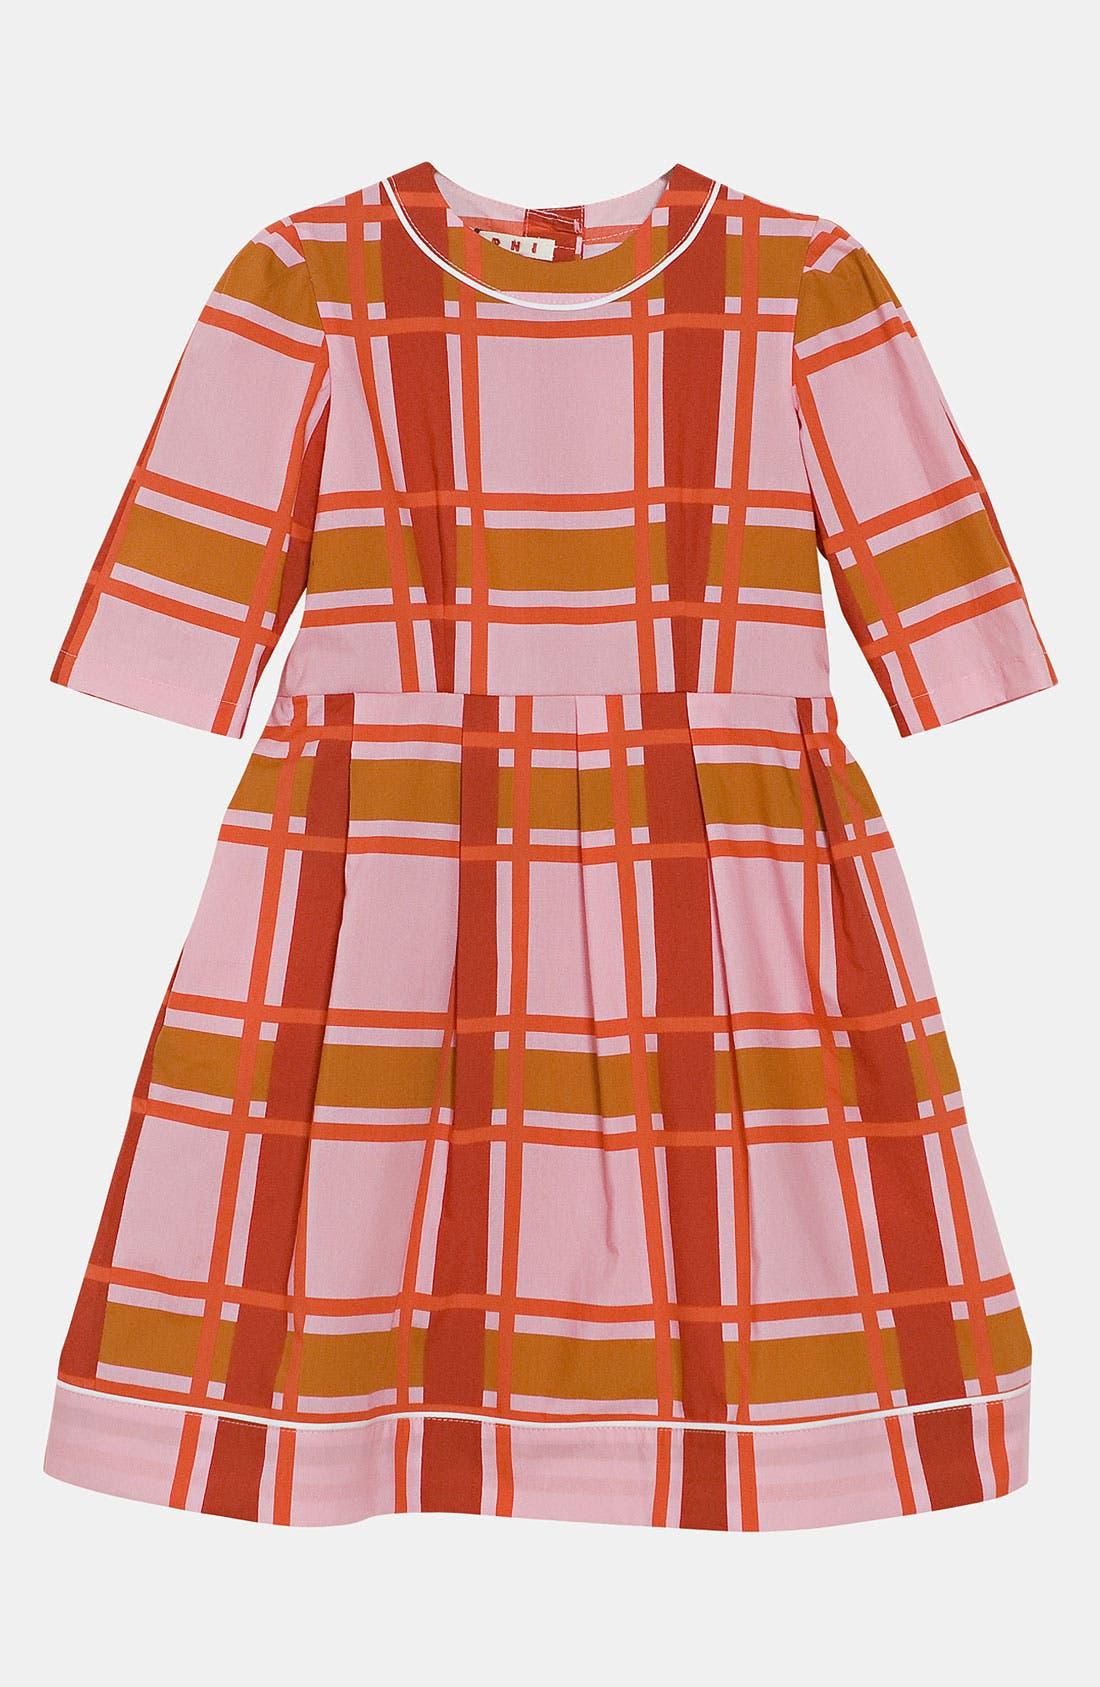 Alternate Image 1 Selected - Marni Dress (Little Girls & Big Girls)